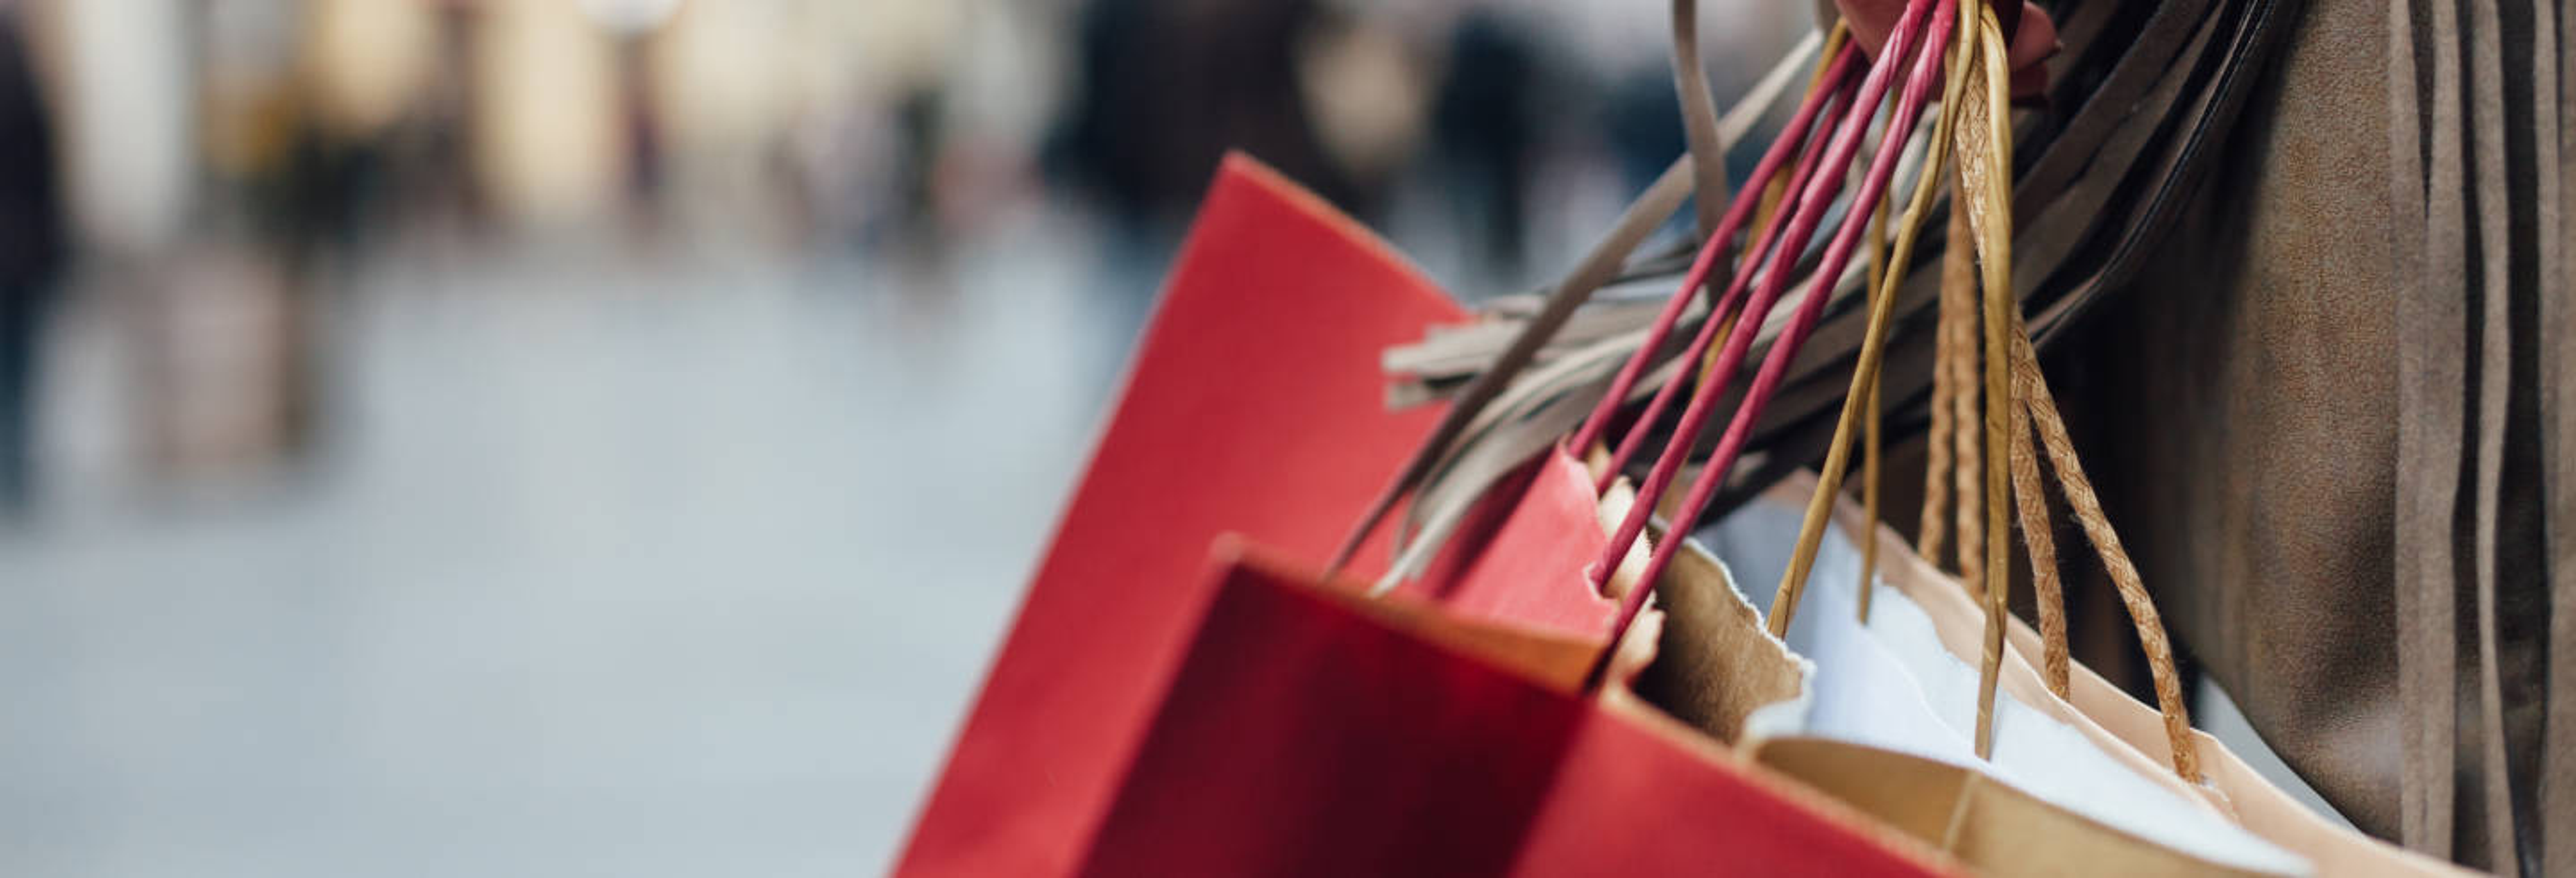 Tour de compras por Kolonaki